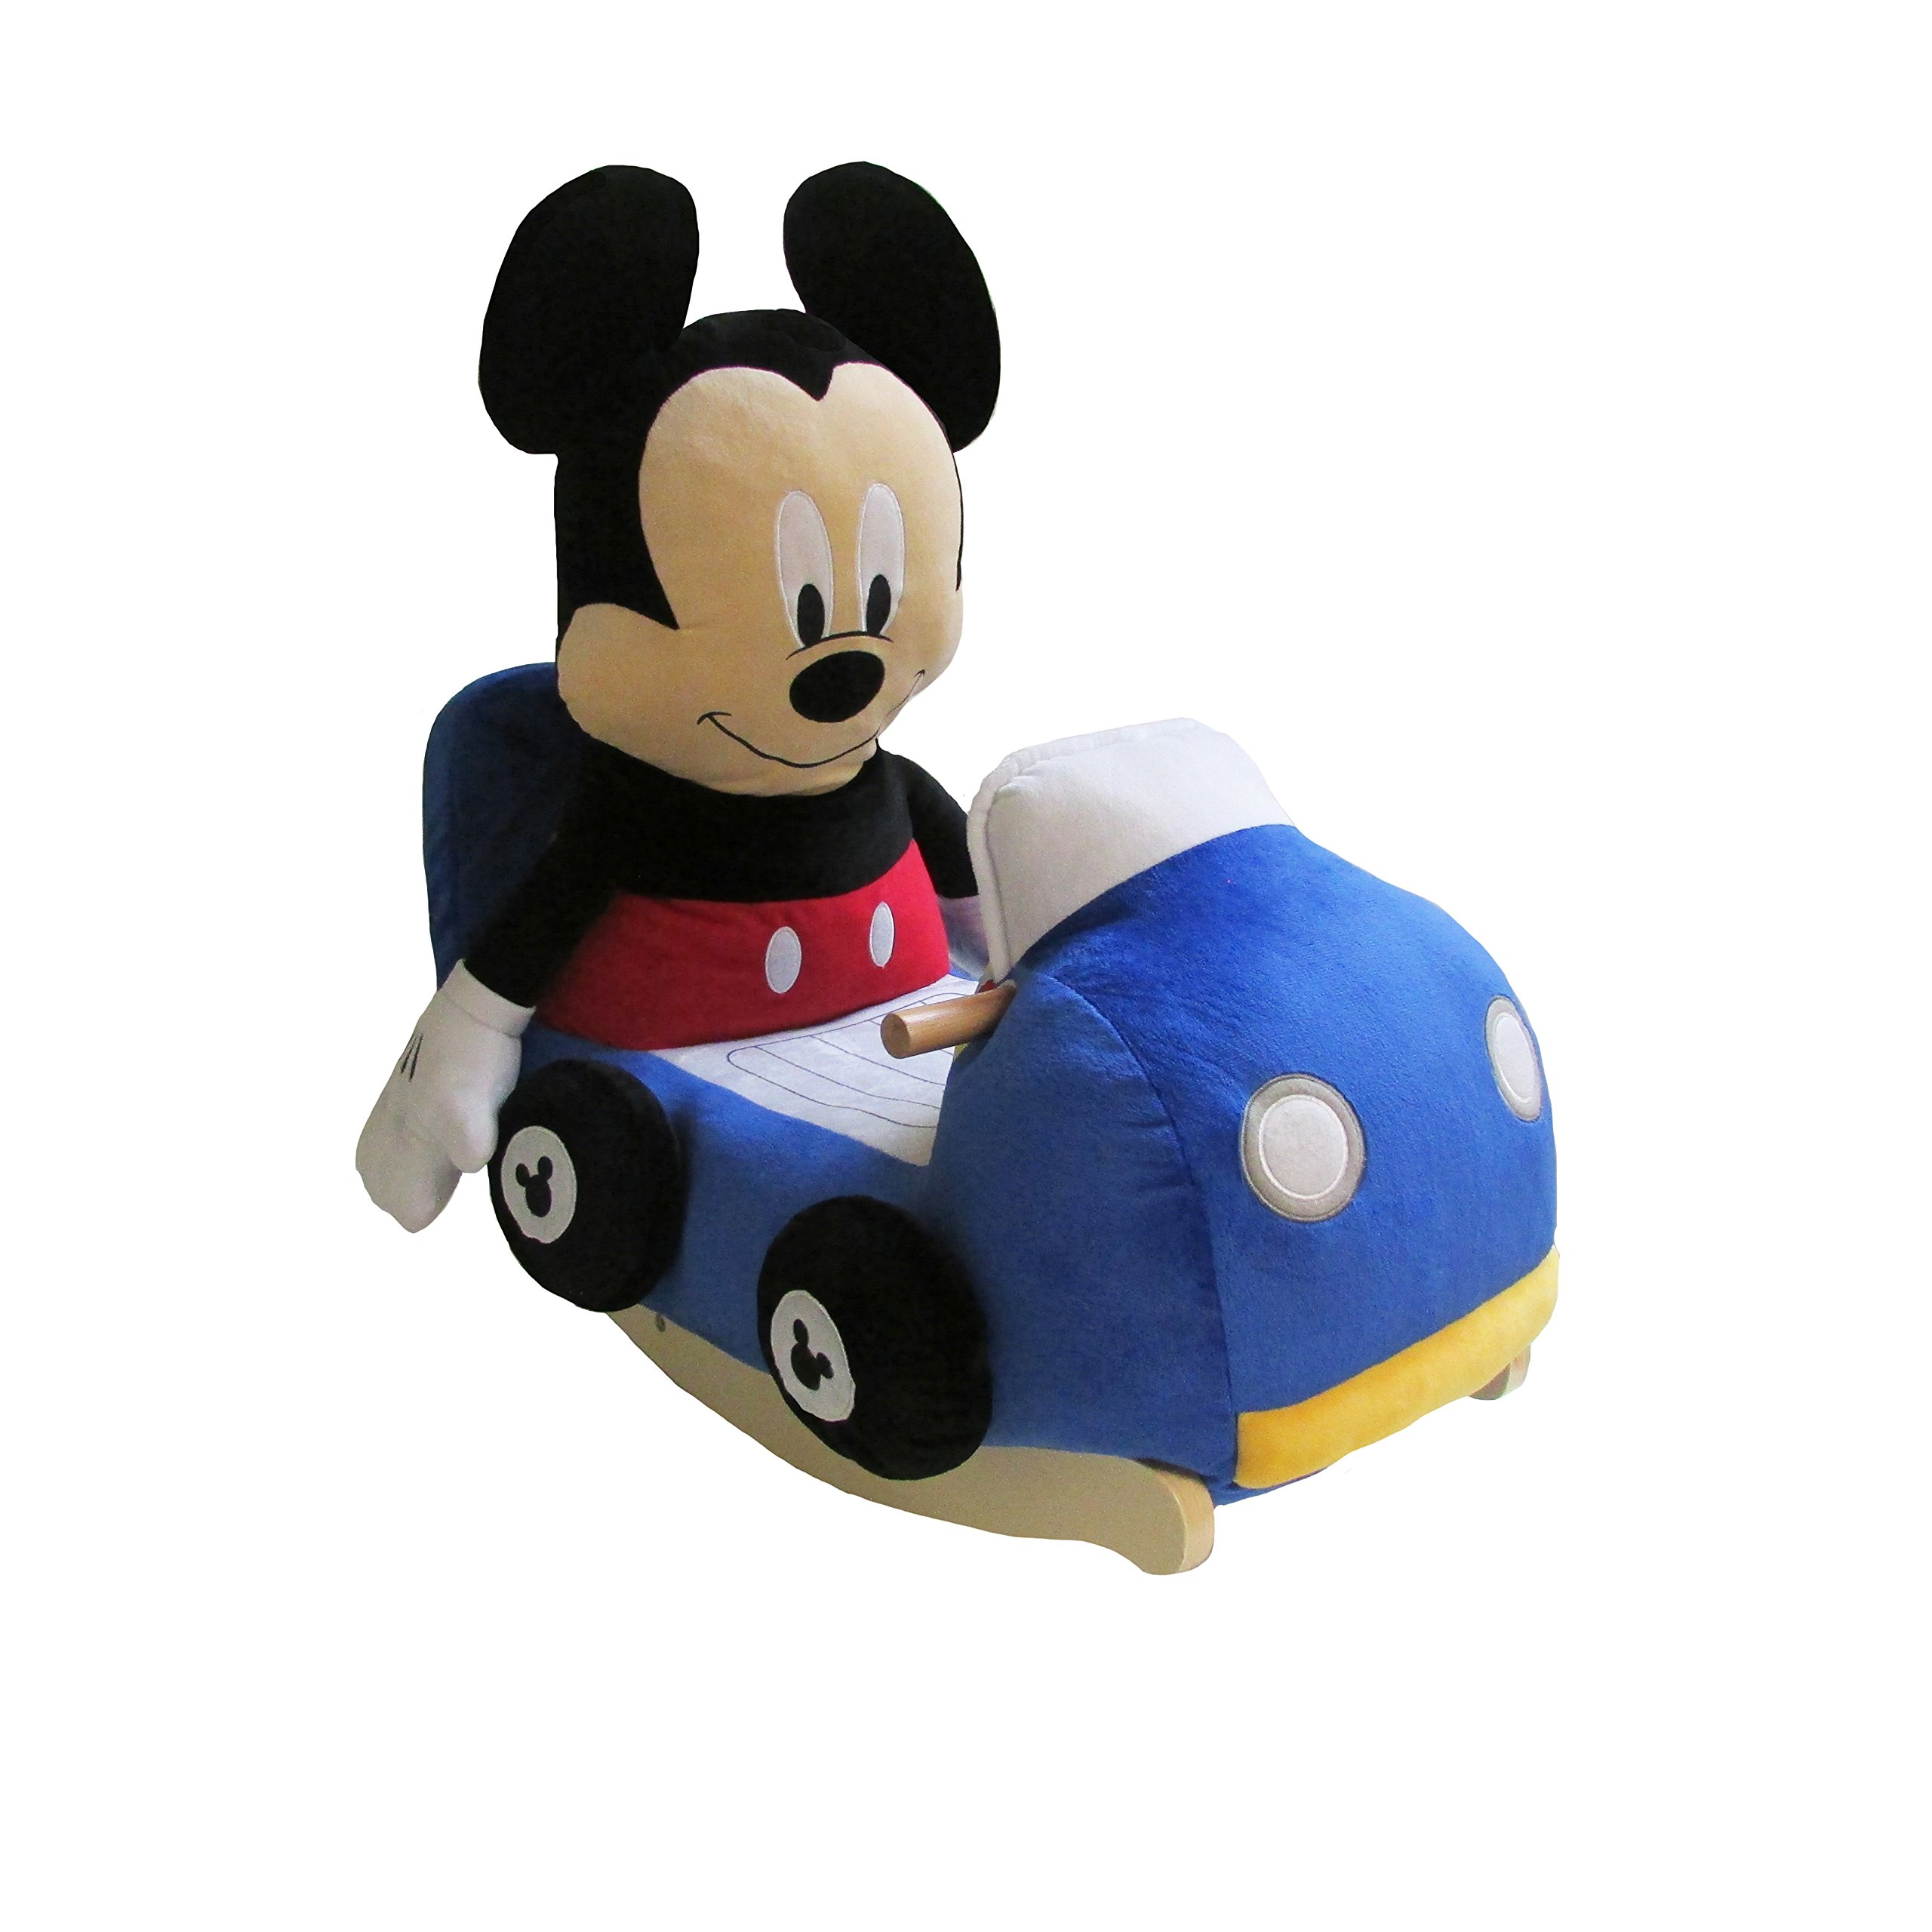 Disney Mickey Mouse Rocker